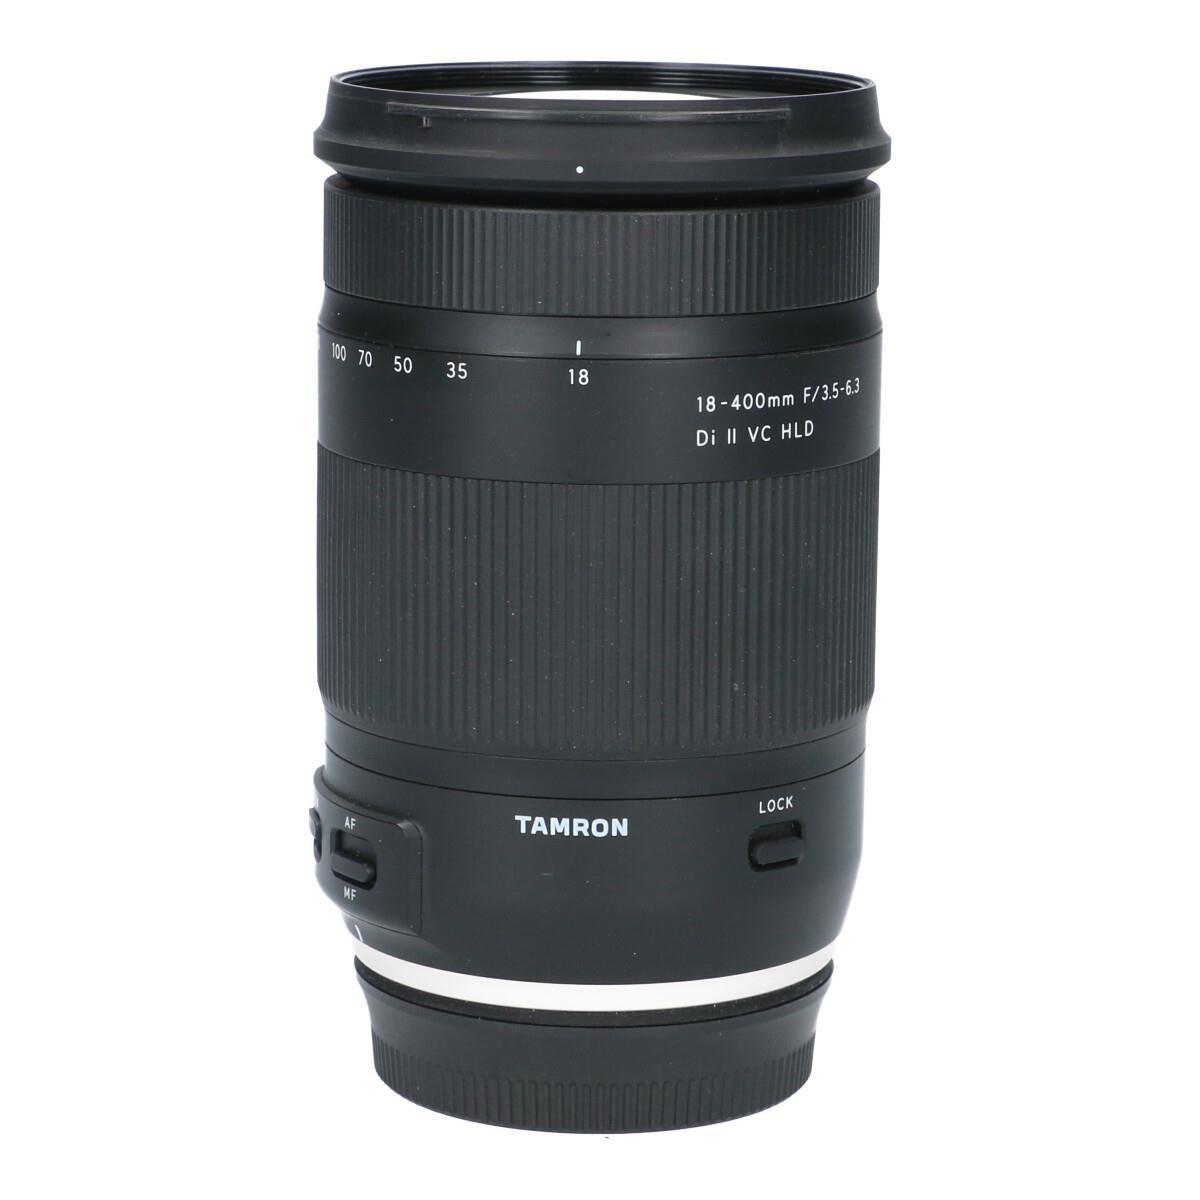 TAMRON EOS(B028)18-400mm F3.5-6.3DI【中古】